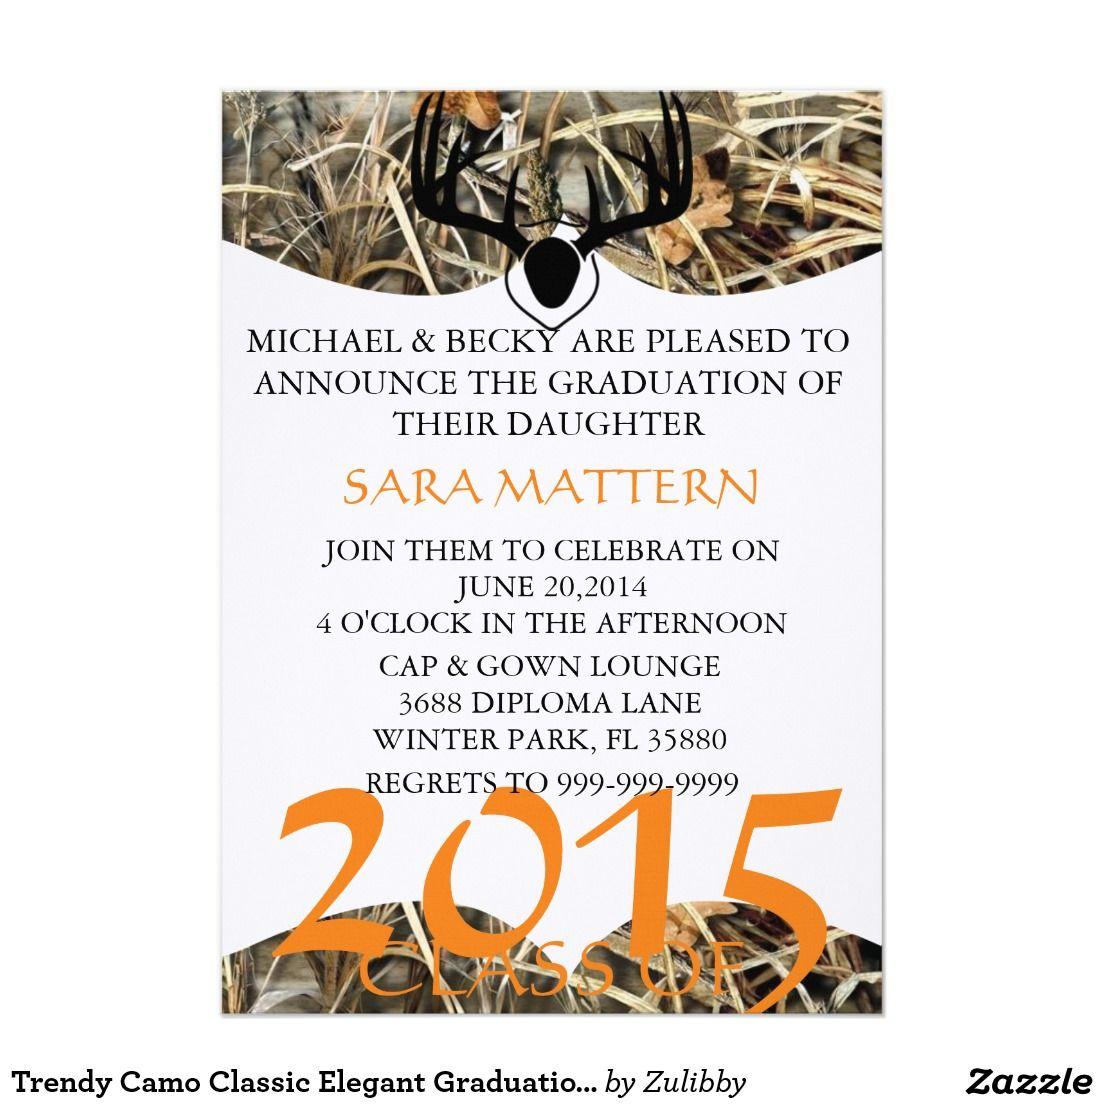 Trendy Camo Classic Elegant Graduation Invitation Camo Graduation